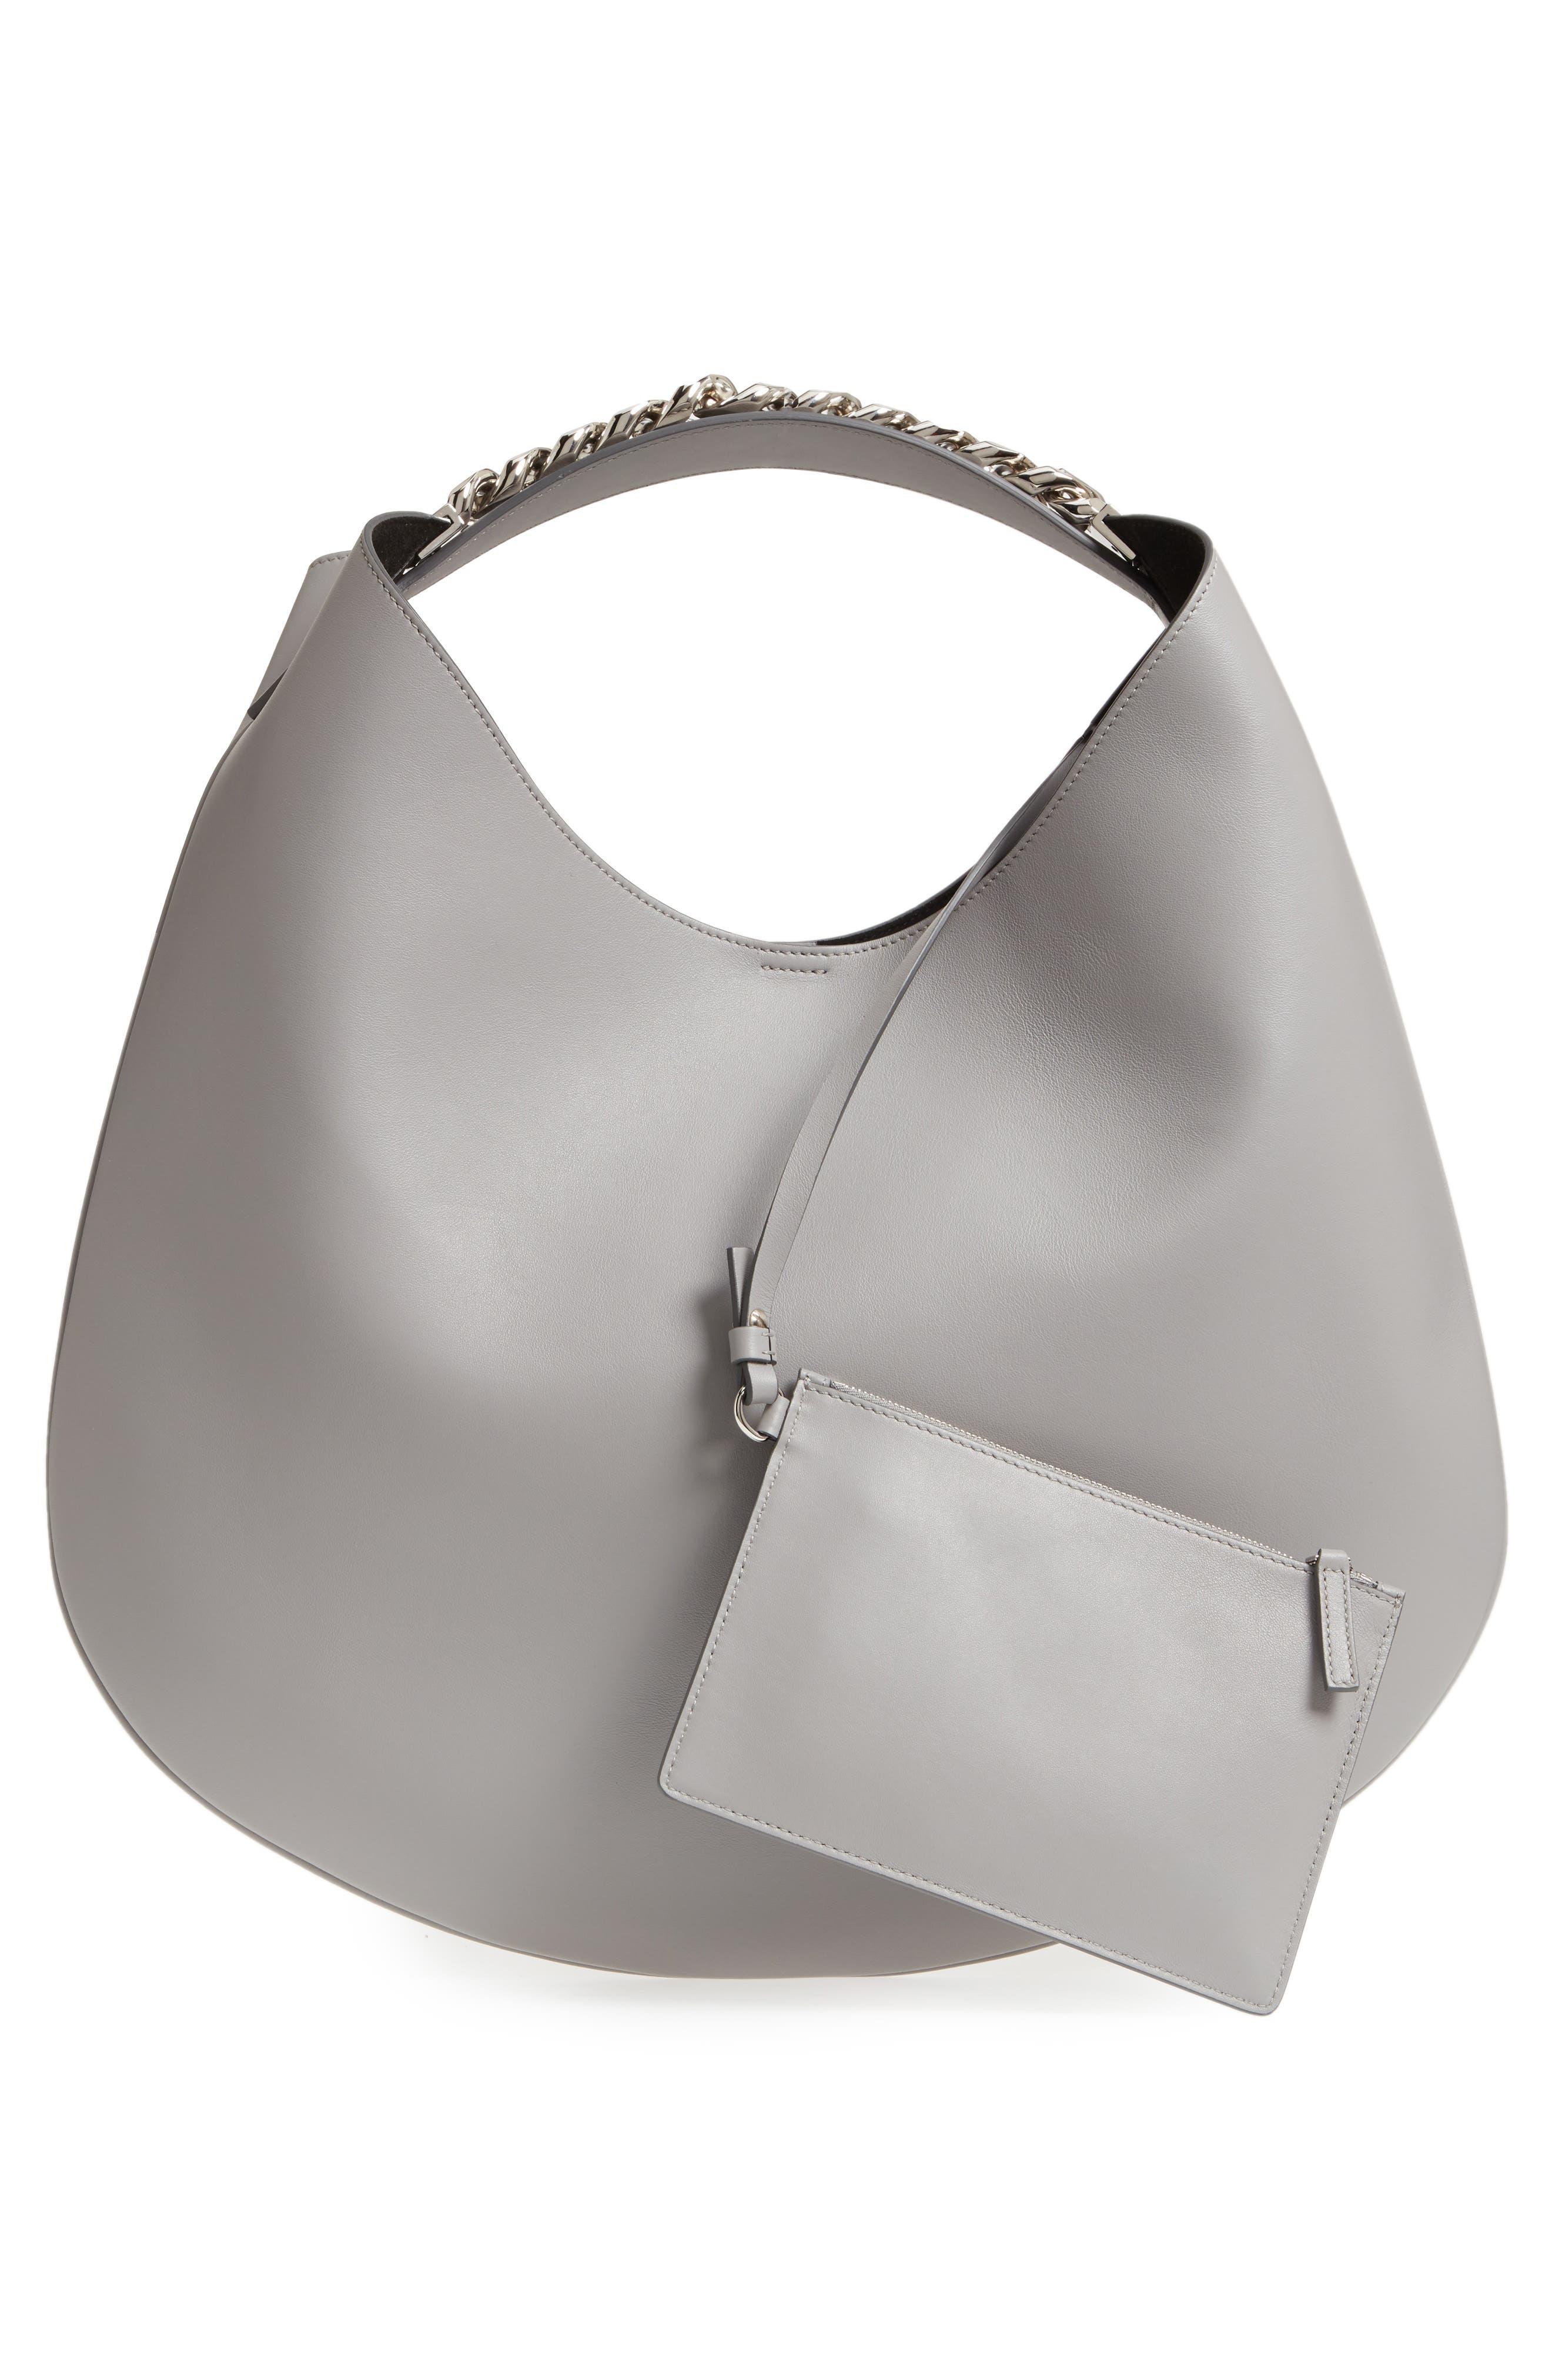 Medium Infinity Calfskin Leather Hobo,                             Alternate thumbnail 2, color,                             Pearl Grey